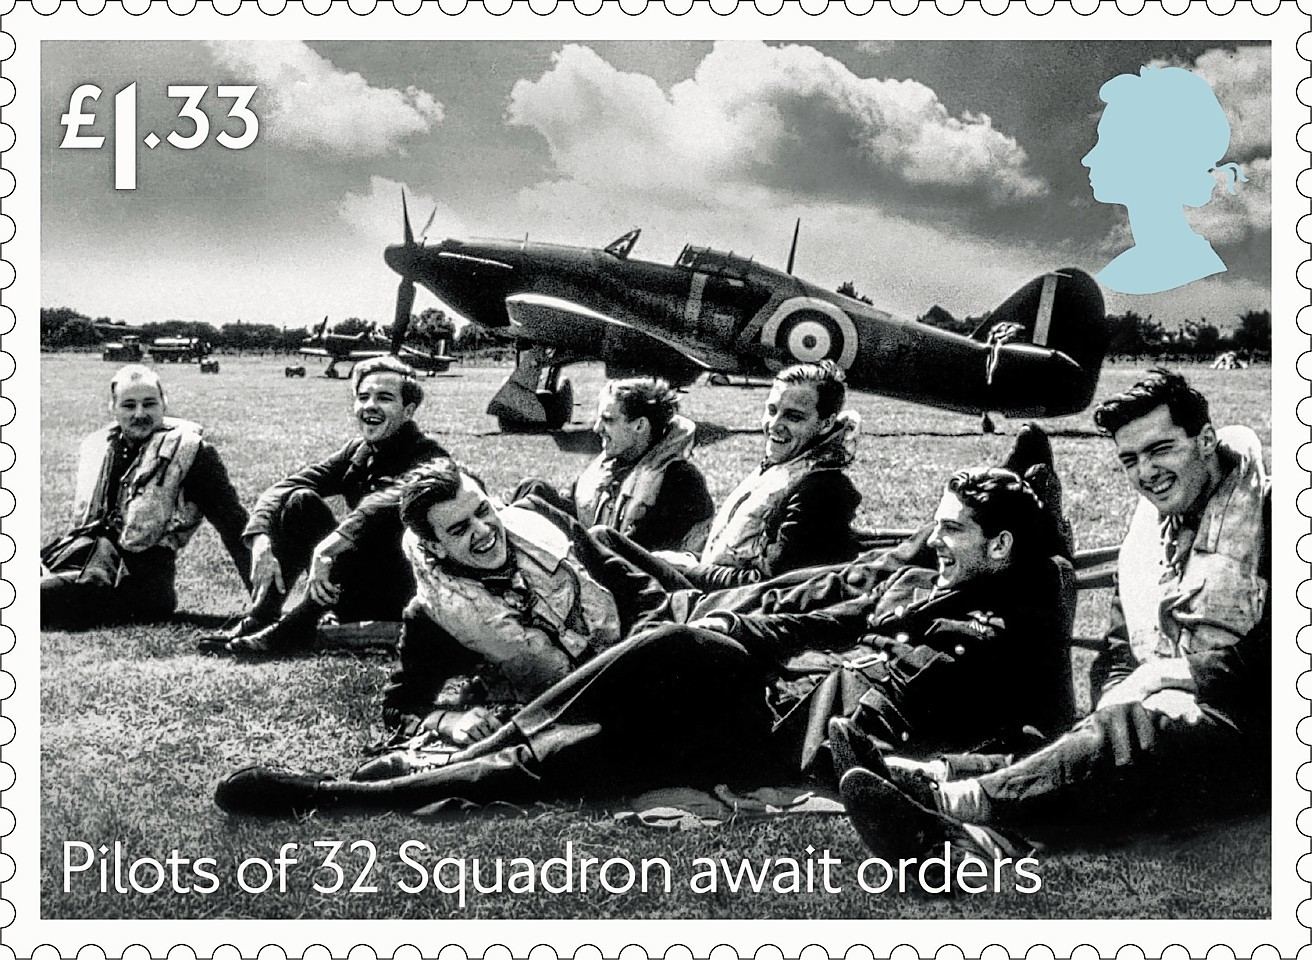 Battle of Britain Stamps Battle of Britain Stamps